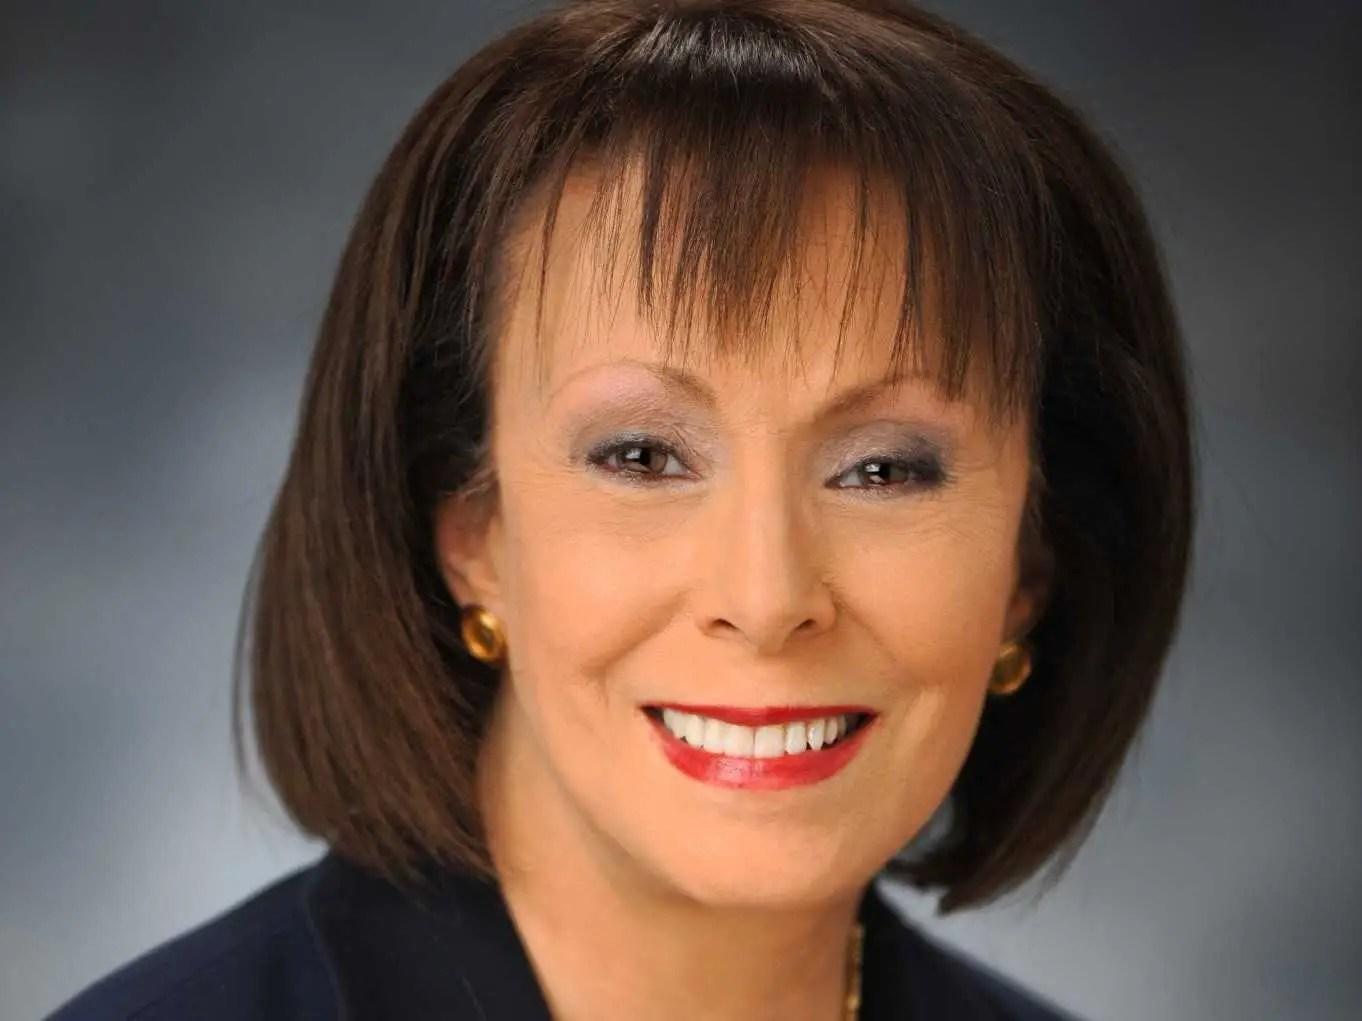 PENNSYLVANIA: Regina Broudy, President Clayton Kendall